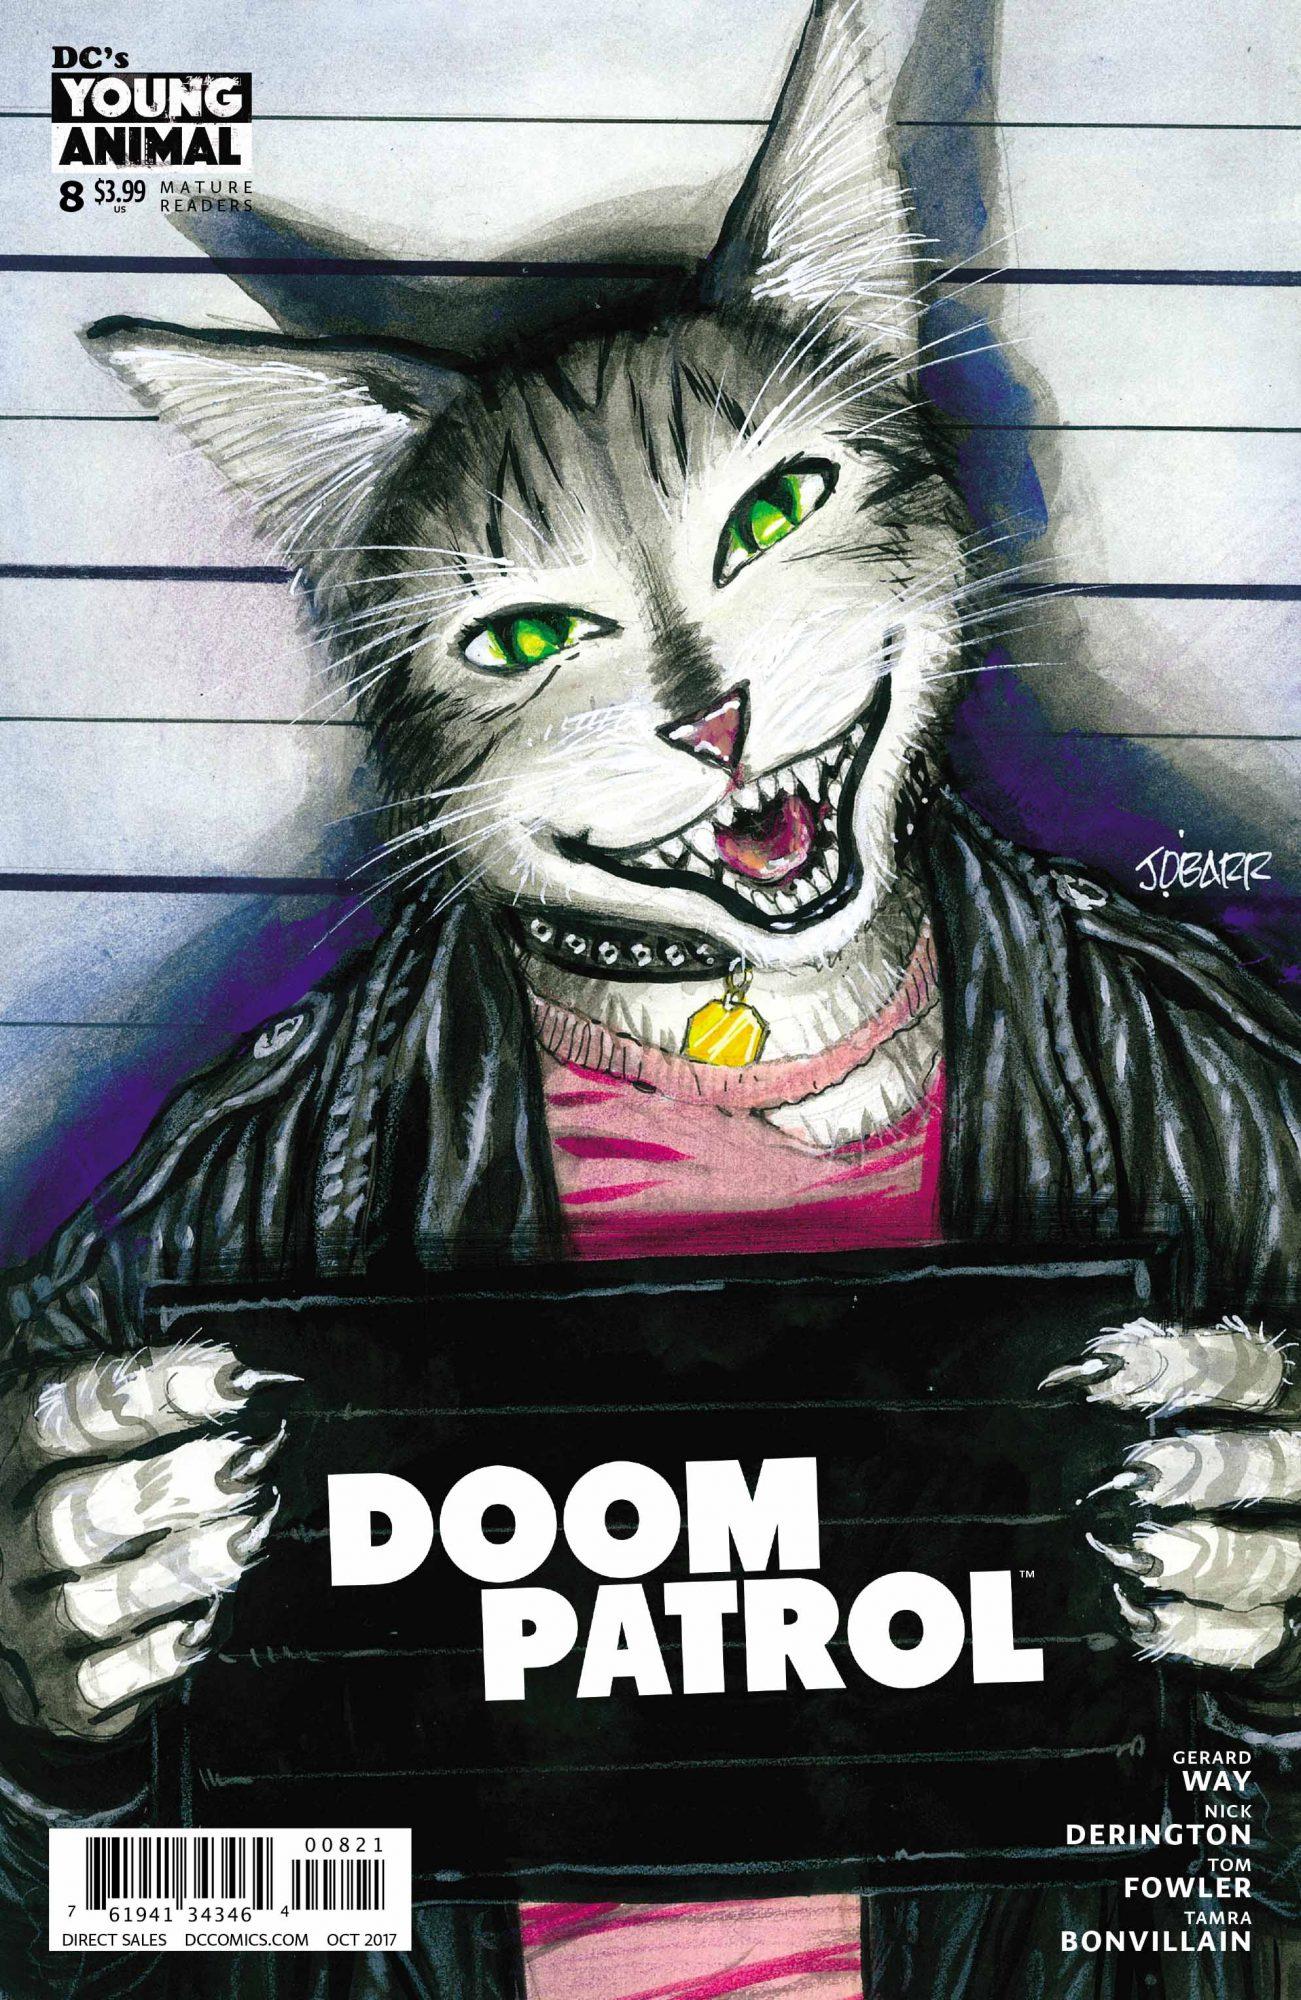 Doom Patrol (2016) #8  variant cover by  James O'Barr .